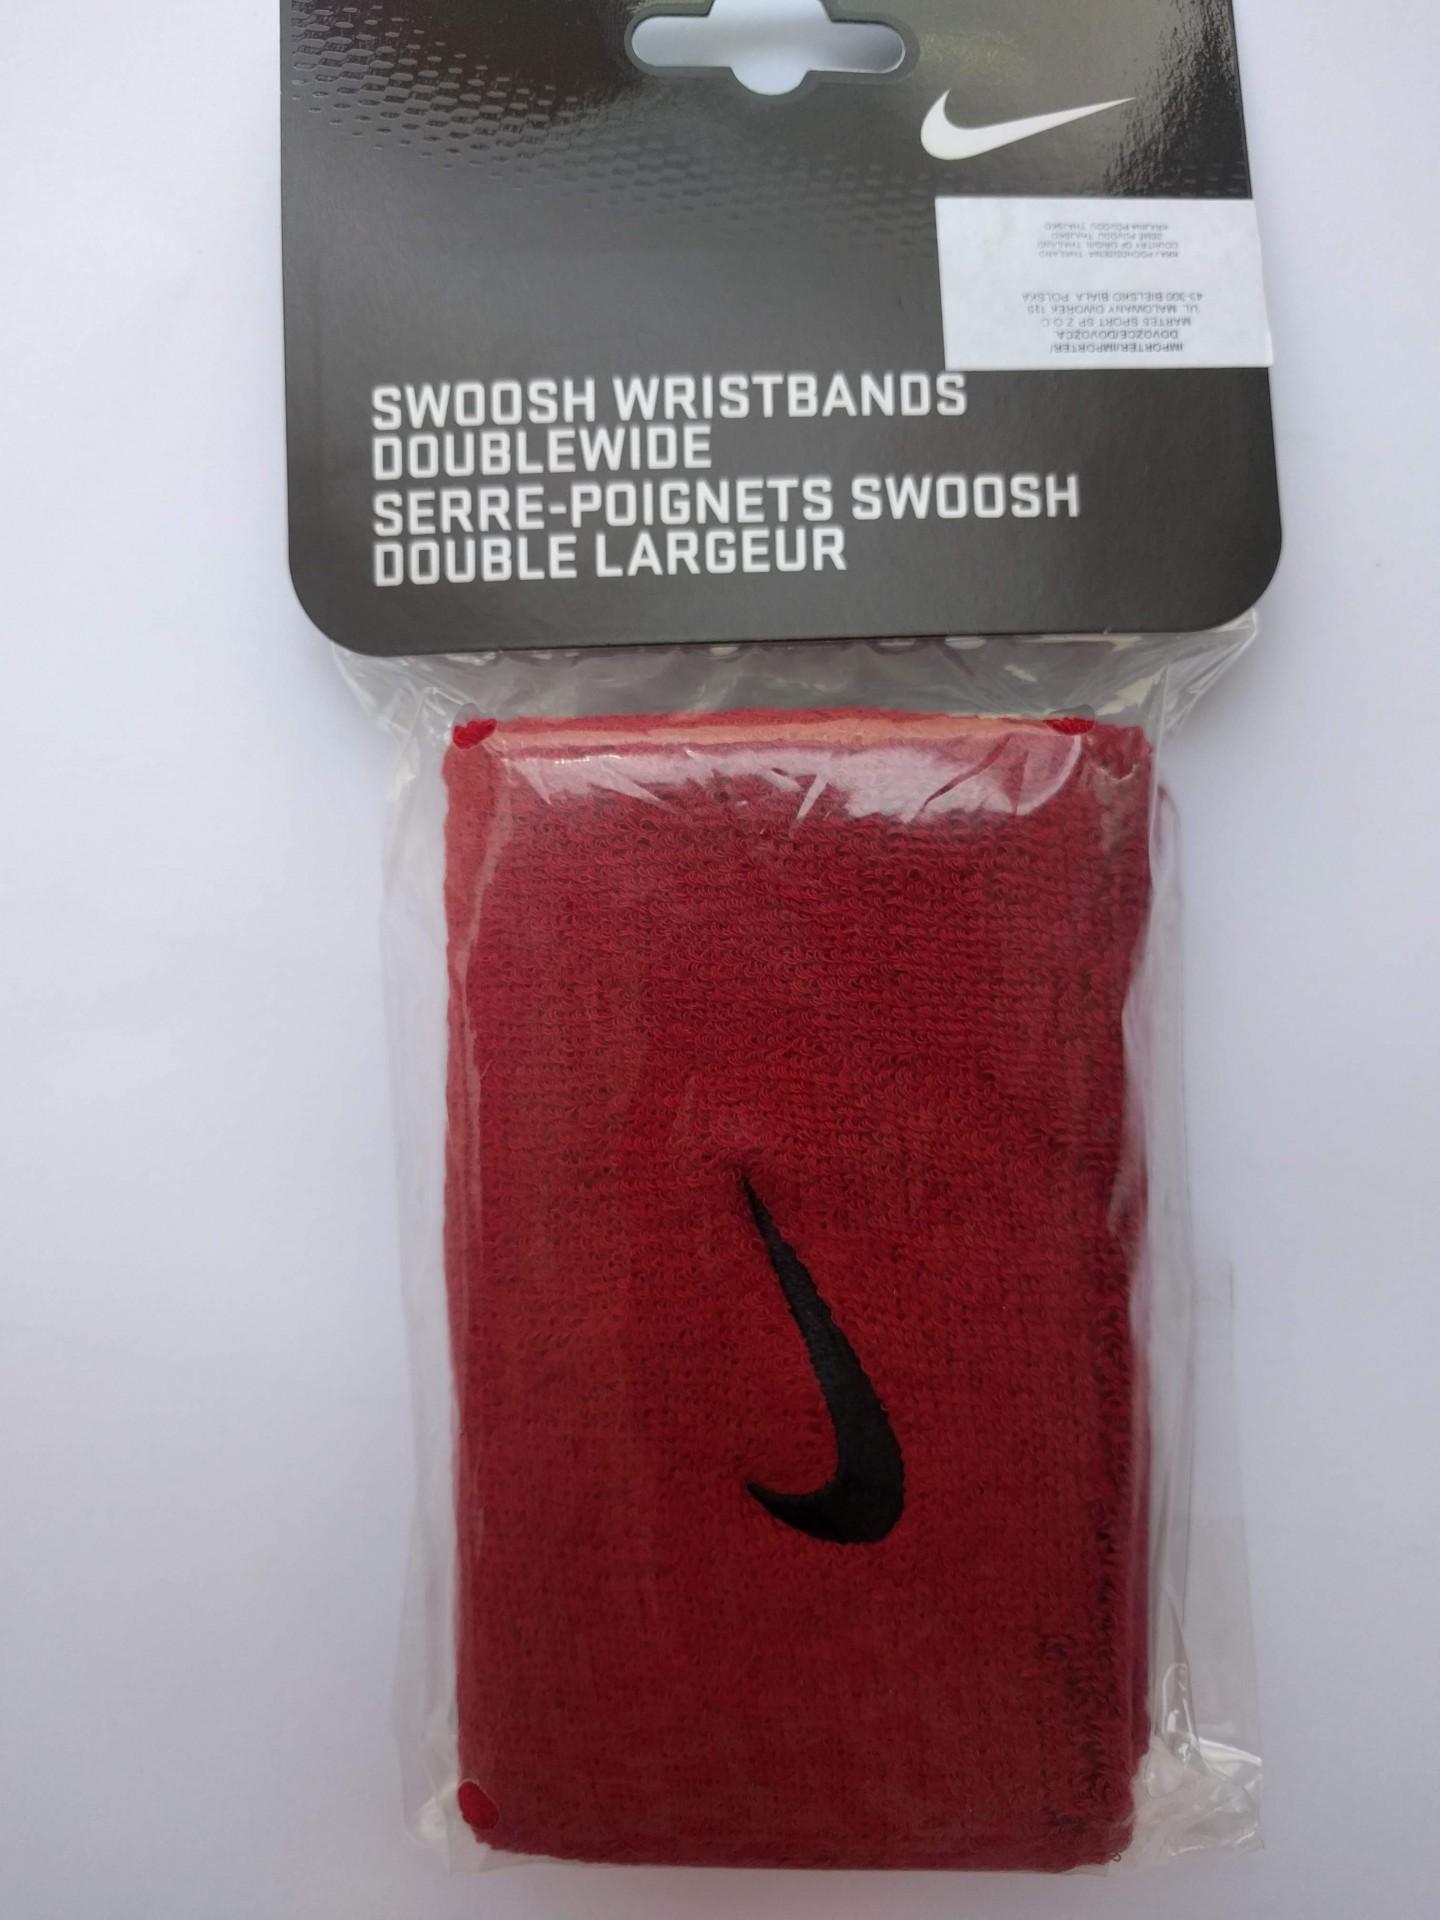 f08f0f48449 Tenisové potítko Nike Swoosh Wristbands Doublewide červená